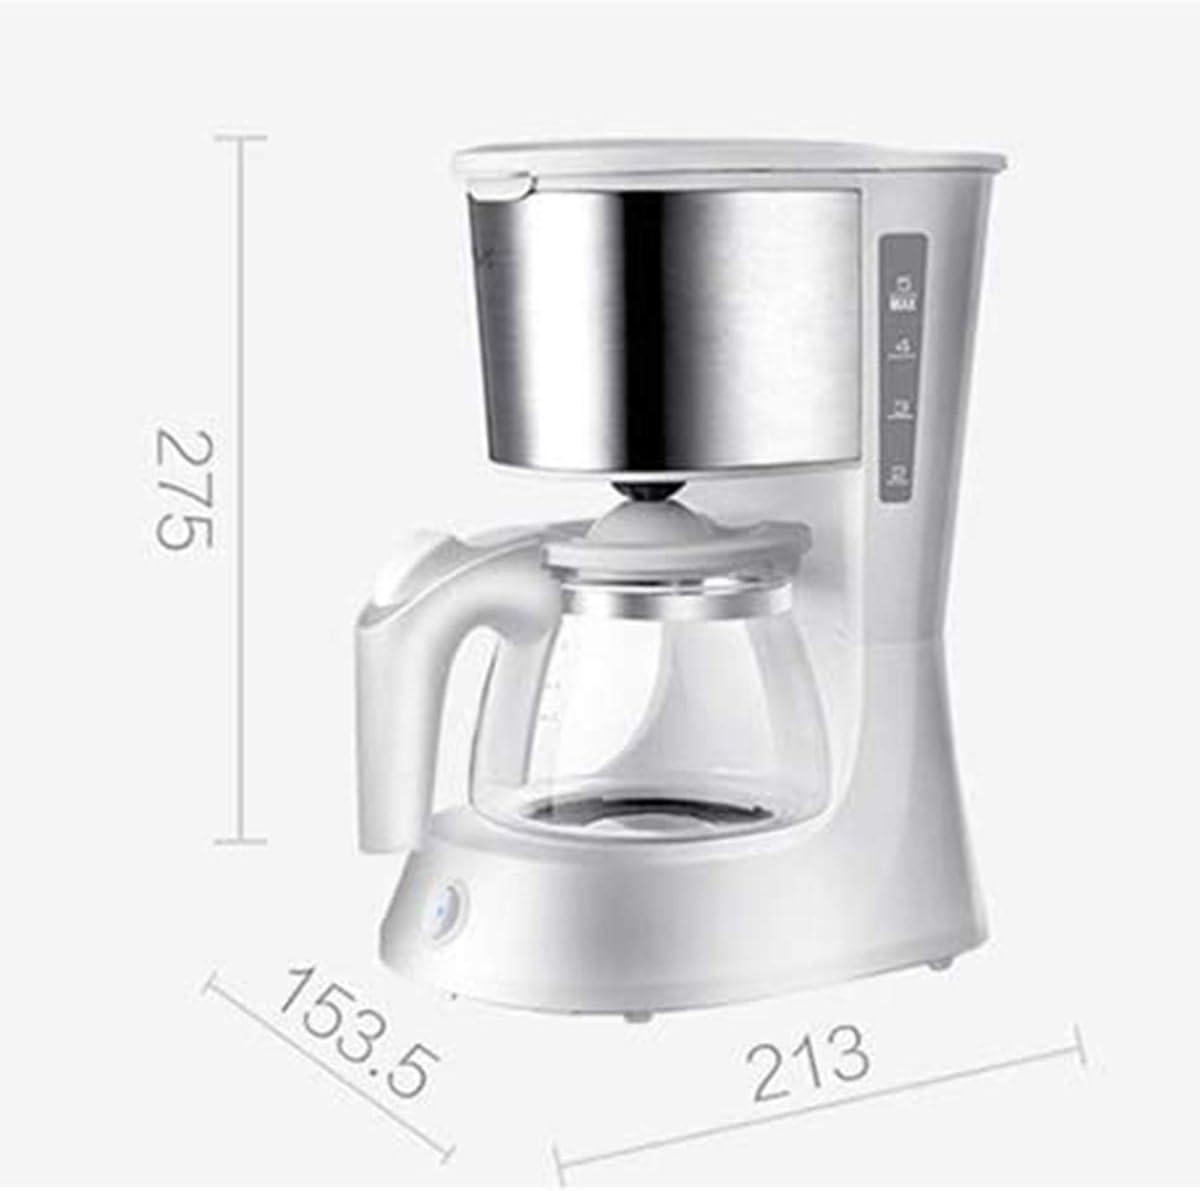 Filtro de café de la máquina, anti-goteo diseño, hogar Cafetera exprés con 600 ml de cristal Caldera, polvo del café de filtro, anti-goteo de aislamiento de la tetera: Amazon.es: Hogar